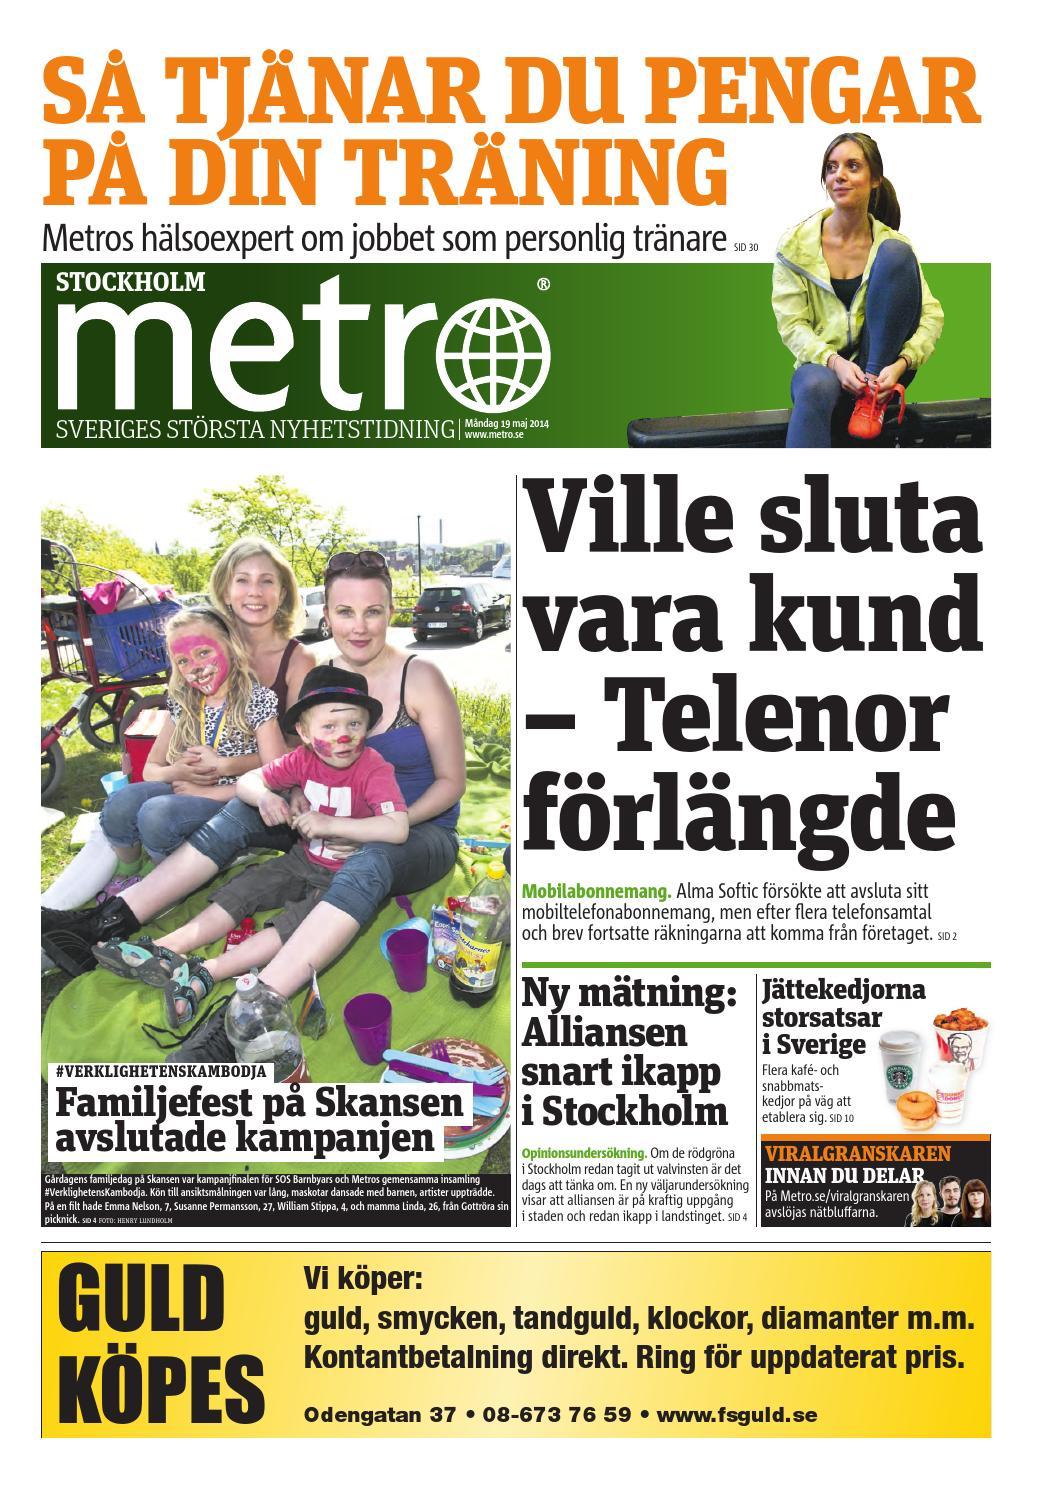 20140519 se stockholm by Metro Sweden - issuu e405d514b3d61